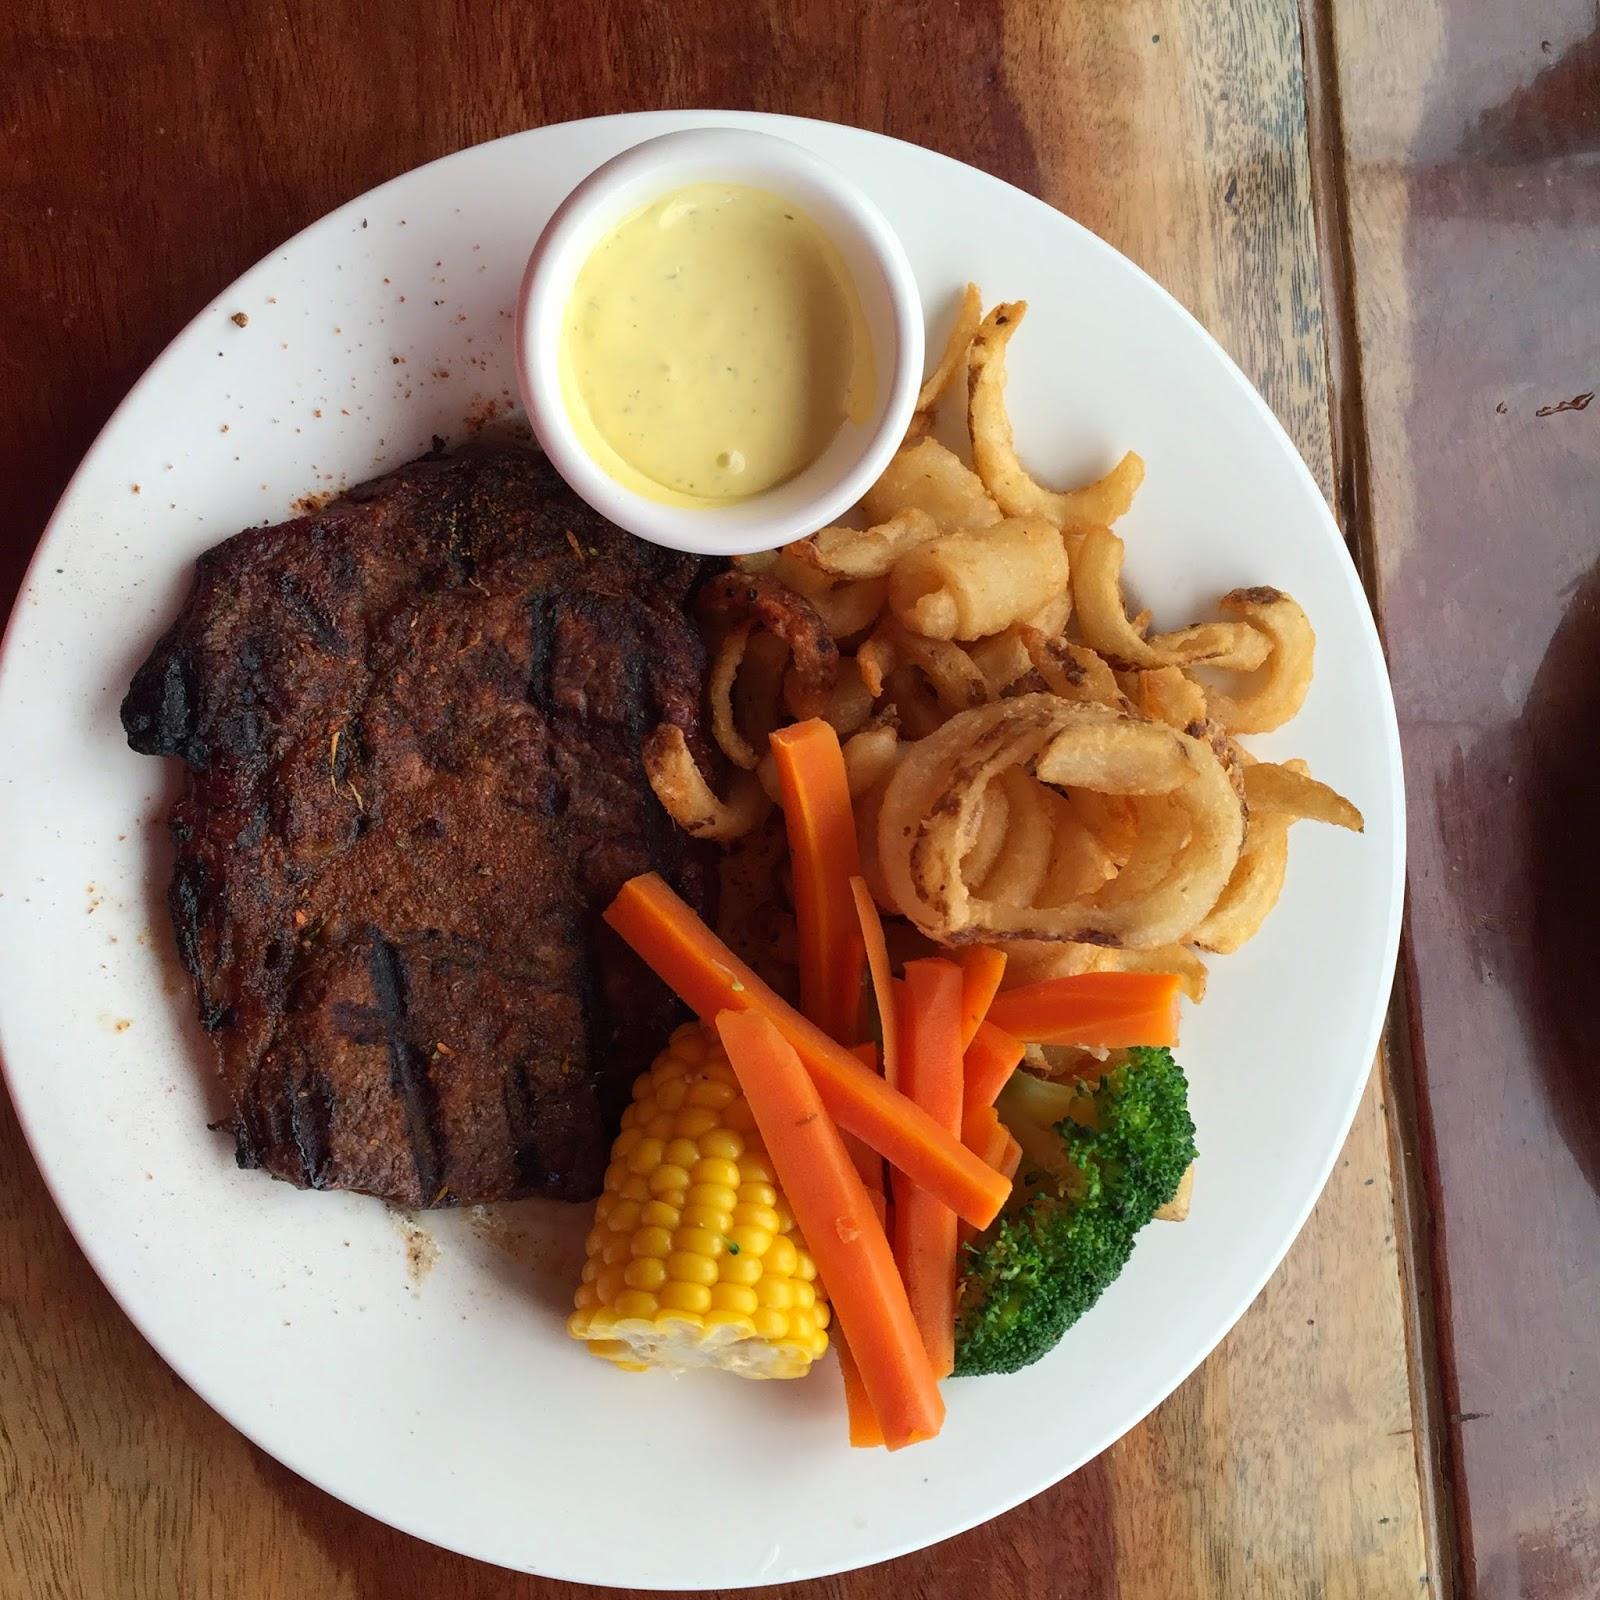 SFH Lunch at Cronulla beach - Blackened Steak